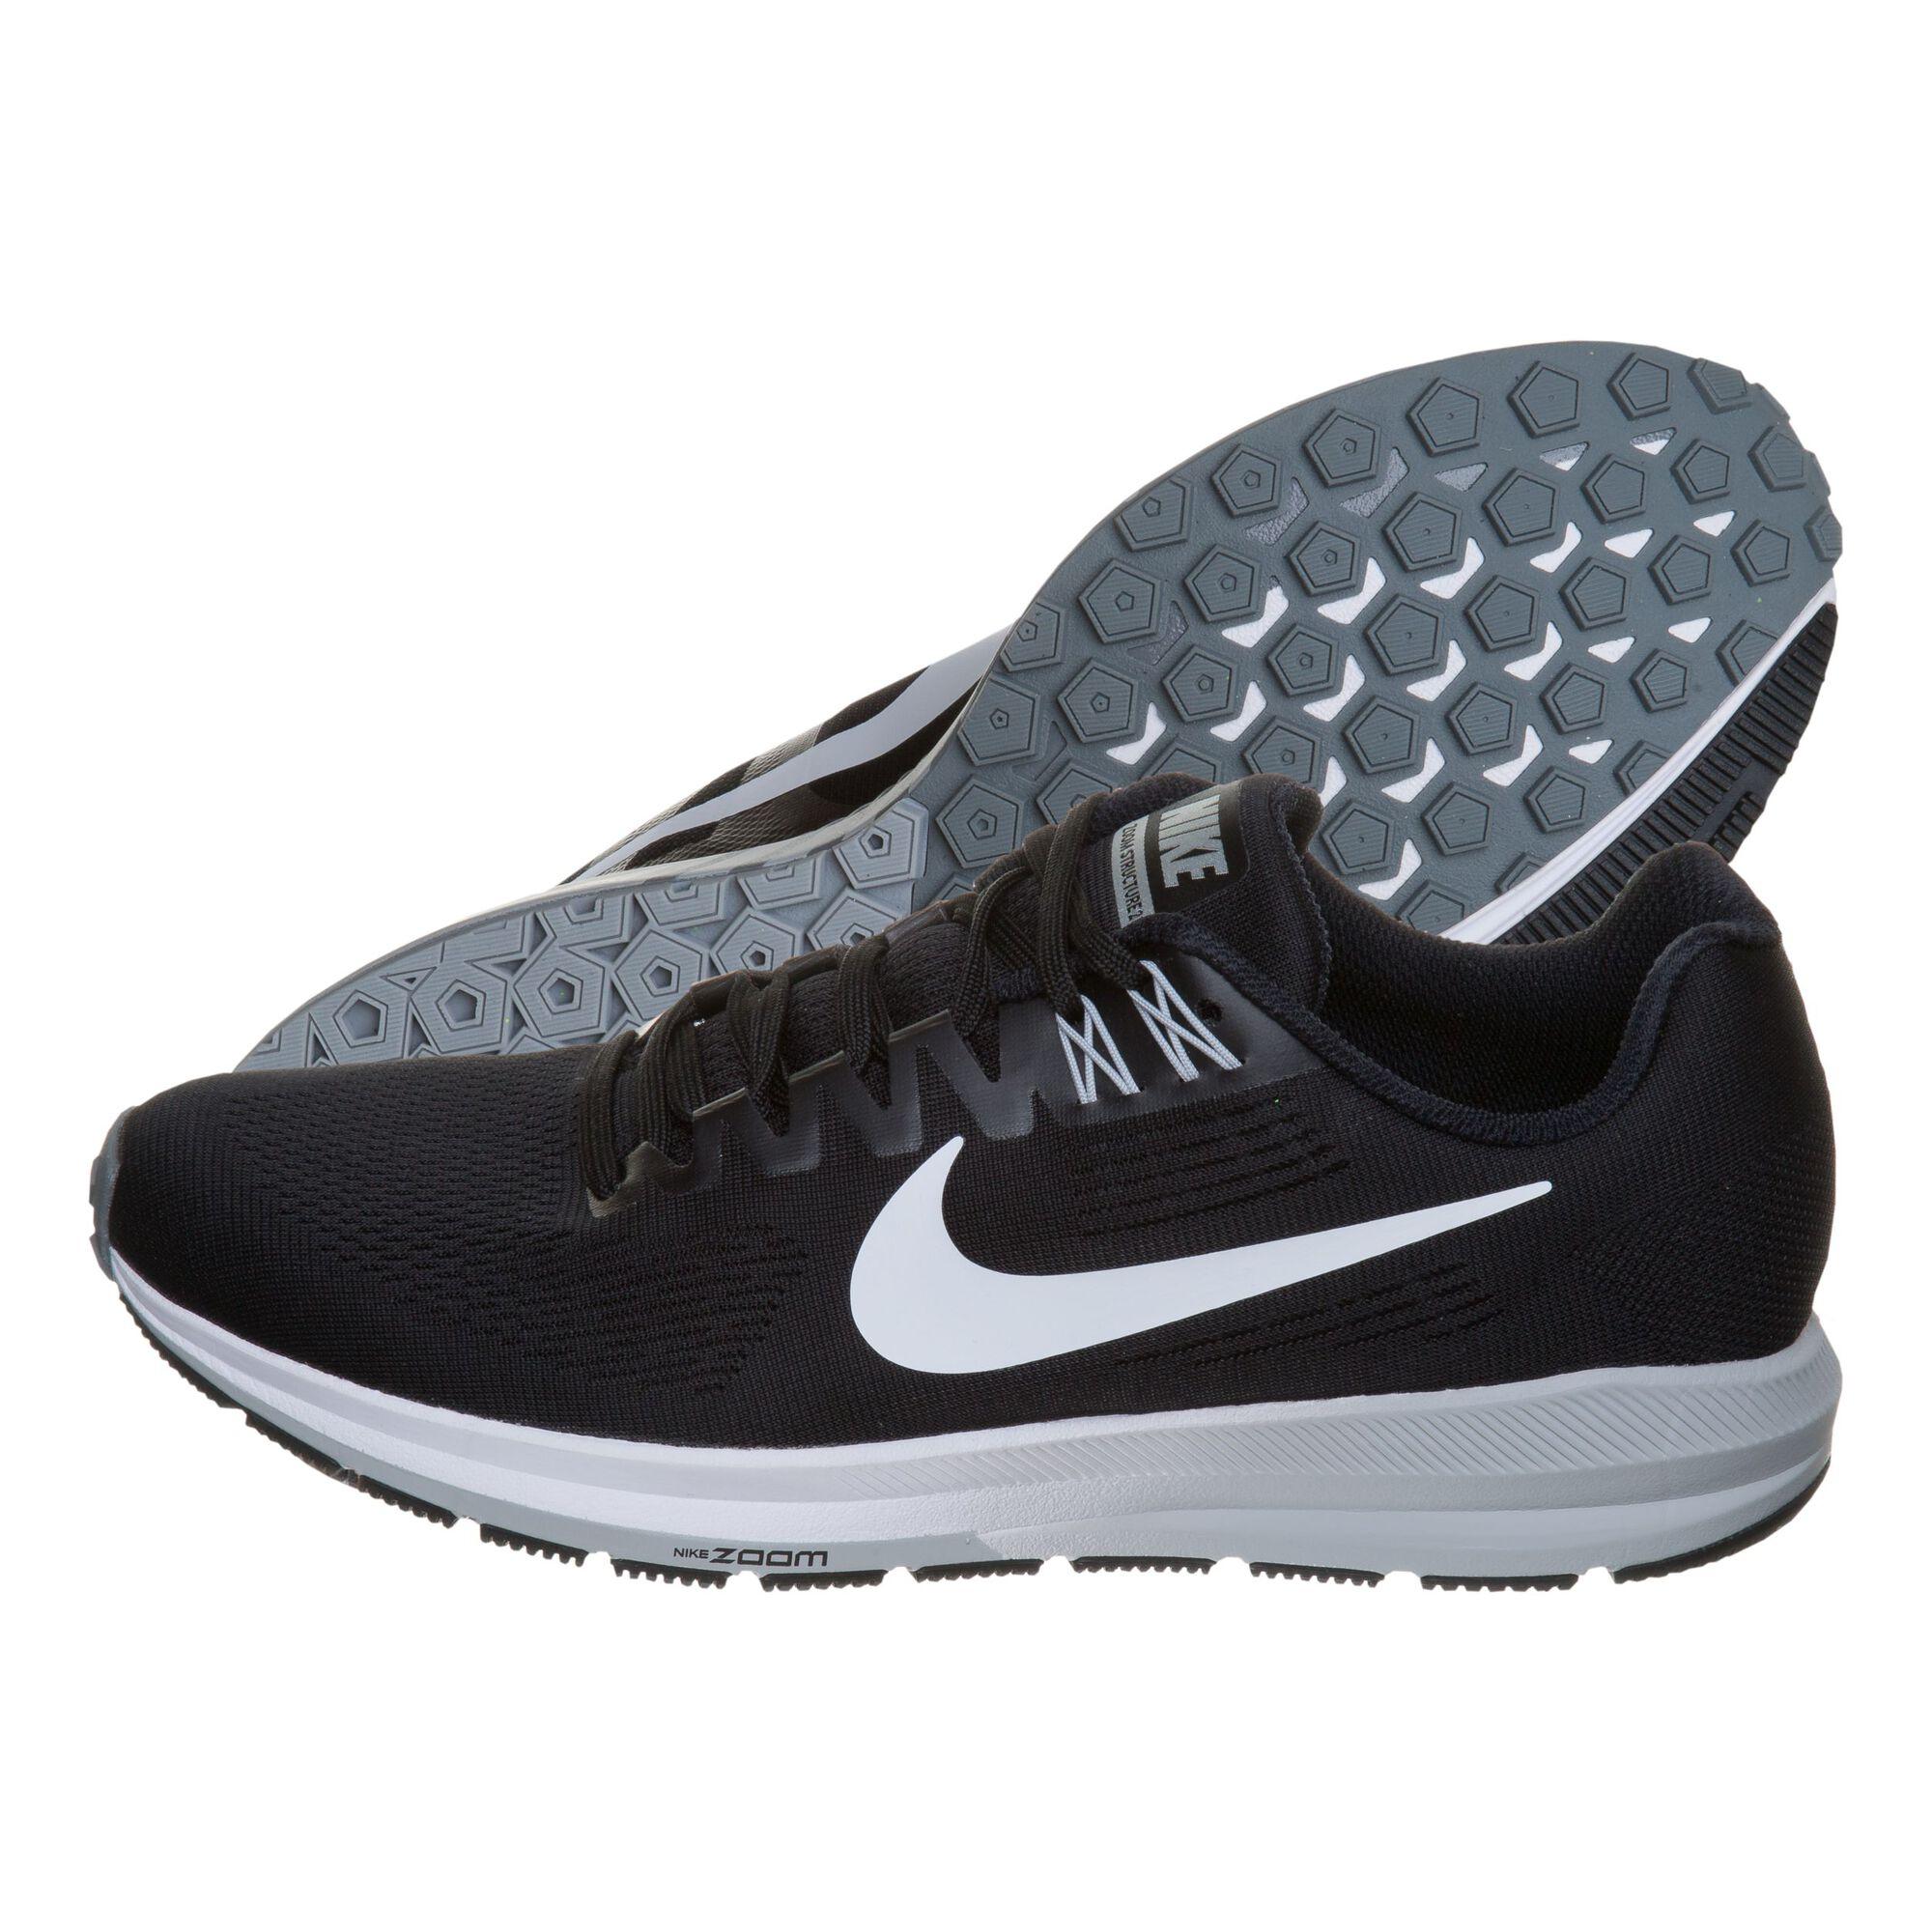 ... Nike · Nike · Nike · Nike · Nike · Nike. Air Zoom Structure 21 ... 180cbf9207cac